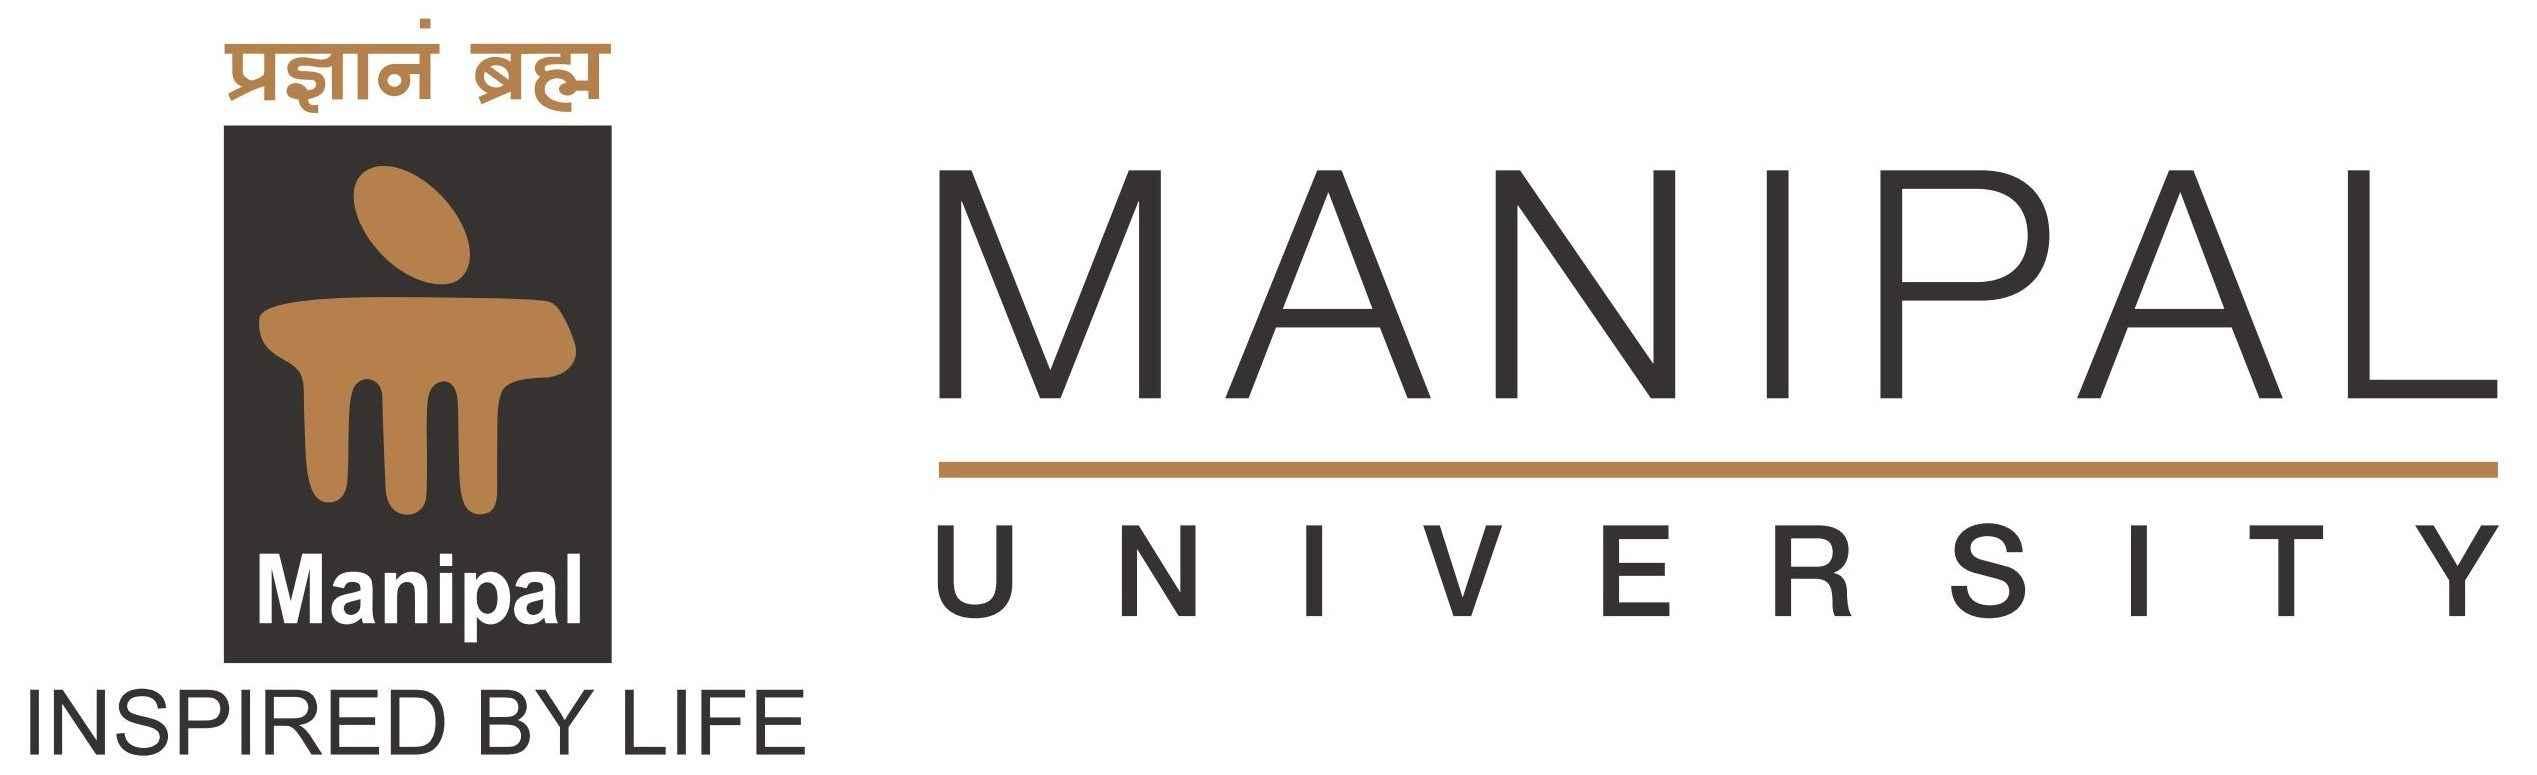 Manipal University Logo [EPS File] png